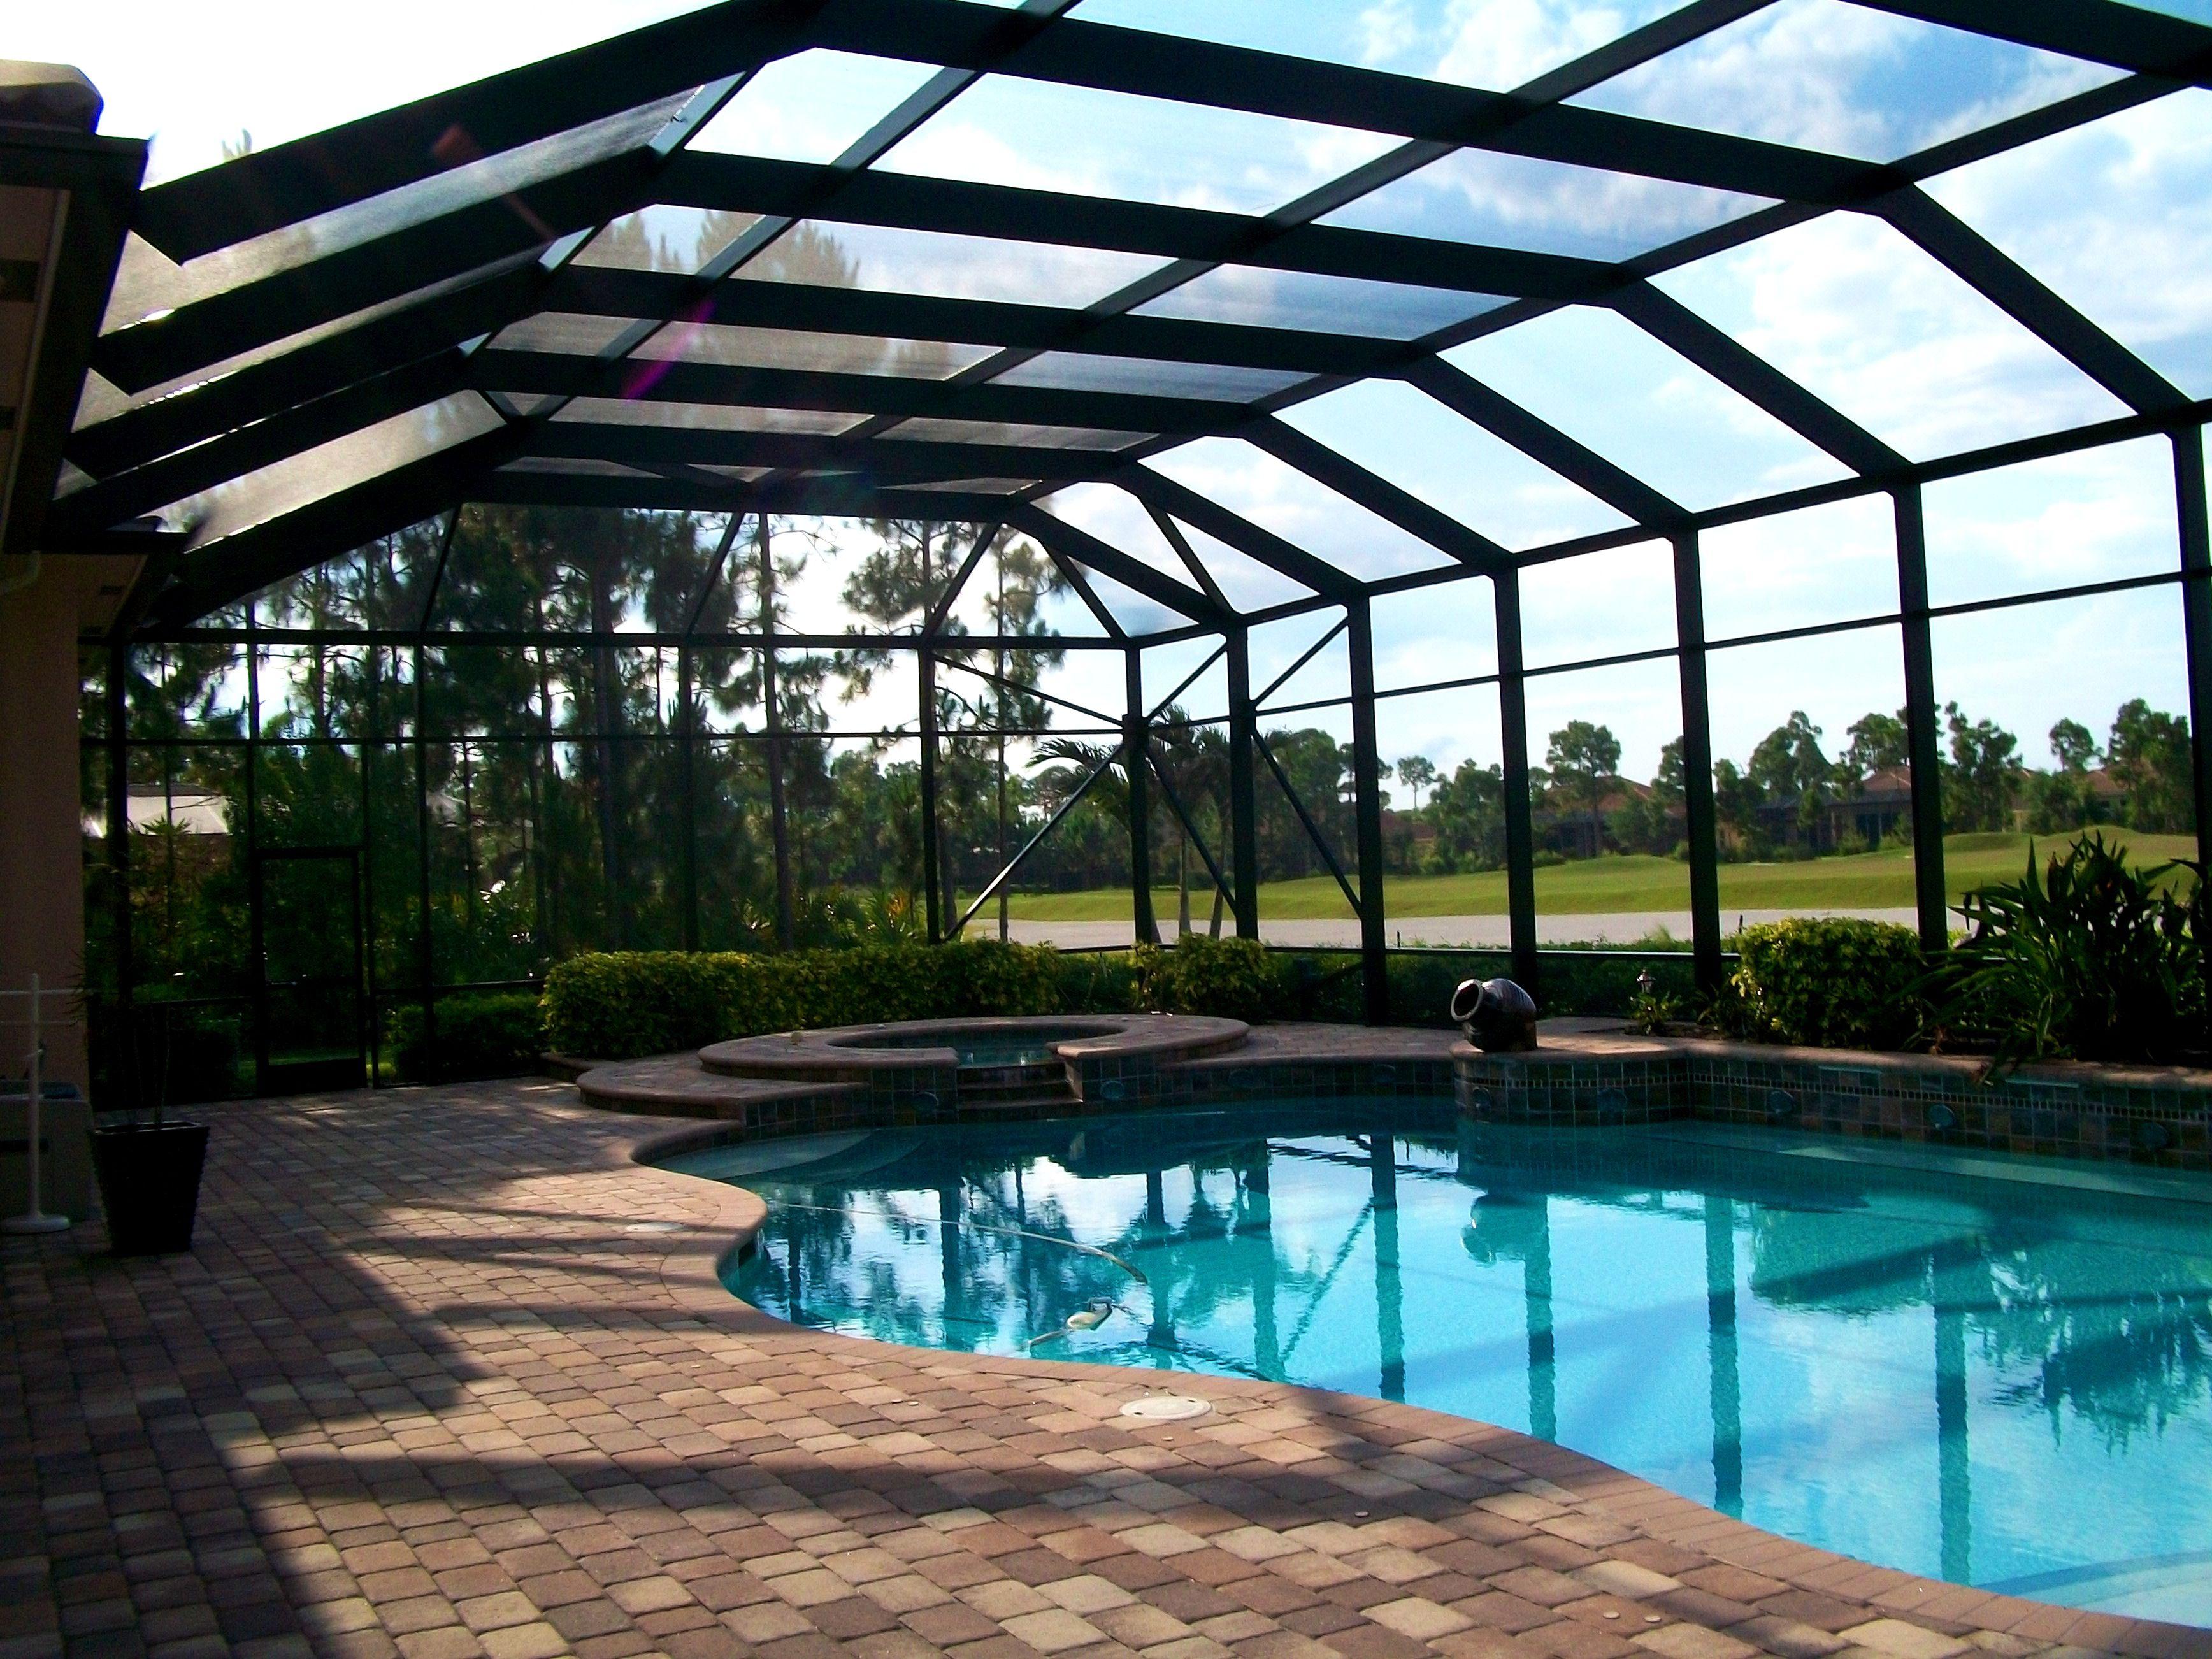 Furniture Pretty Pool Enclosures Ipc Team Patio And Pensacola Universe Privacy Indoor Best Housto Pool Screen Enclosure Pool Enclosures Swimming Pools Backyard